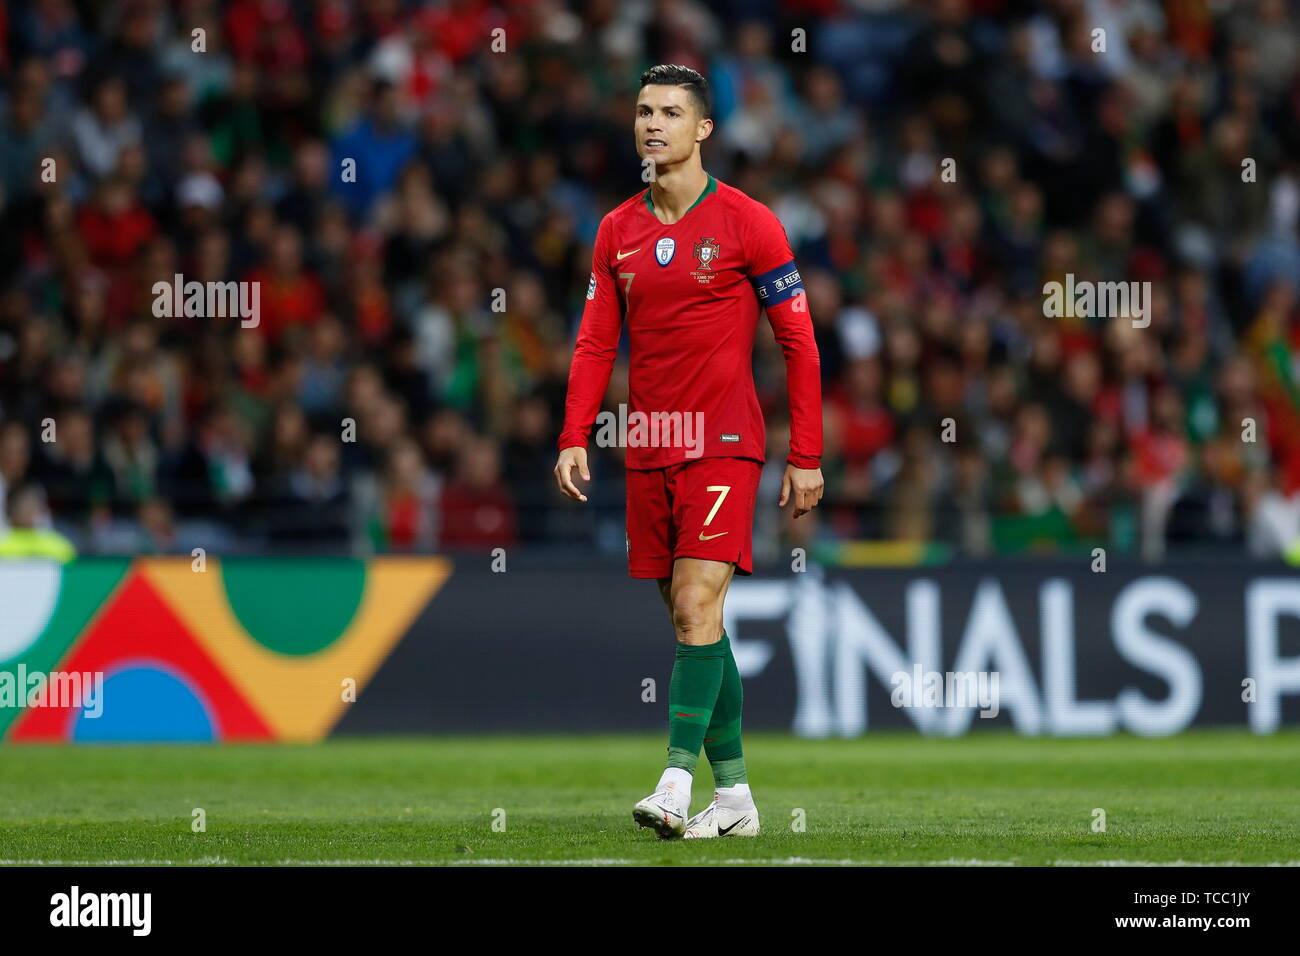 5a58f89b98824b Cristiano Ronaldo (POR) Football/Soccer : UEFA Nations League Semi-finals  match between Portugal 3-1 Switzerland at the Estadio do Dragao in Porto,  ...